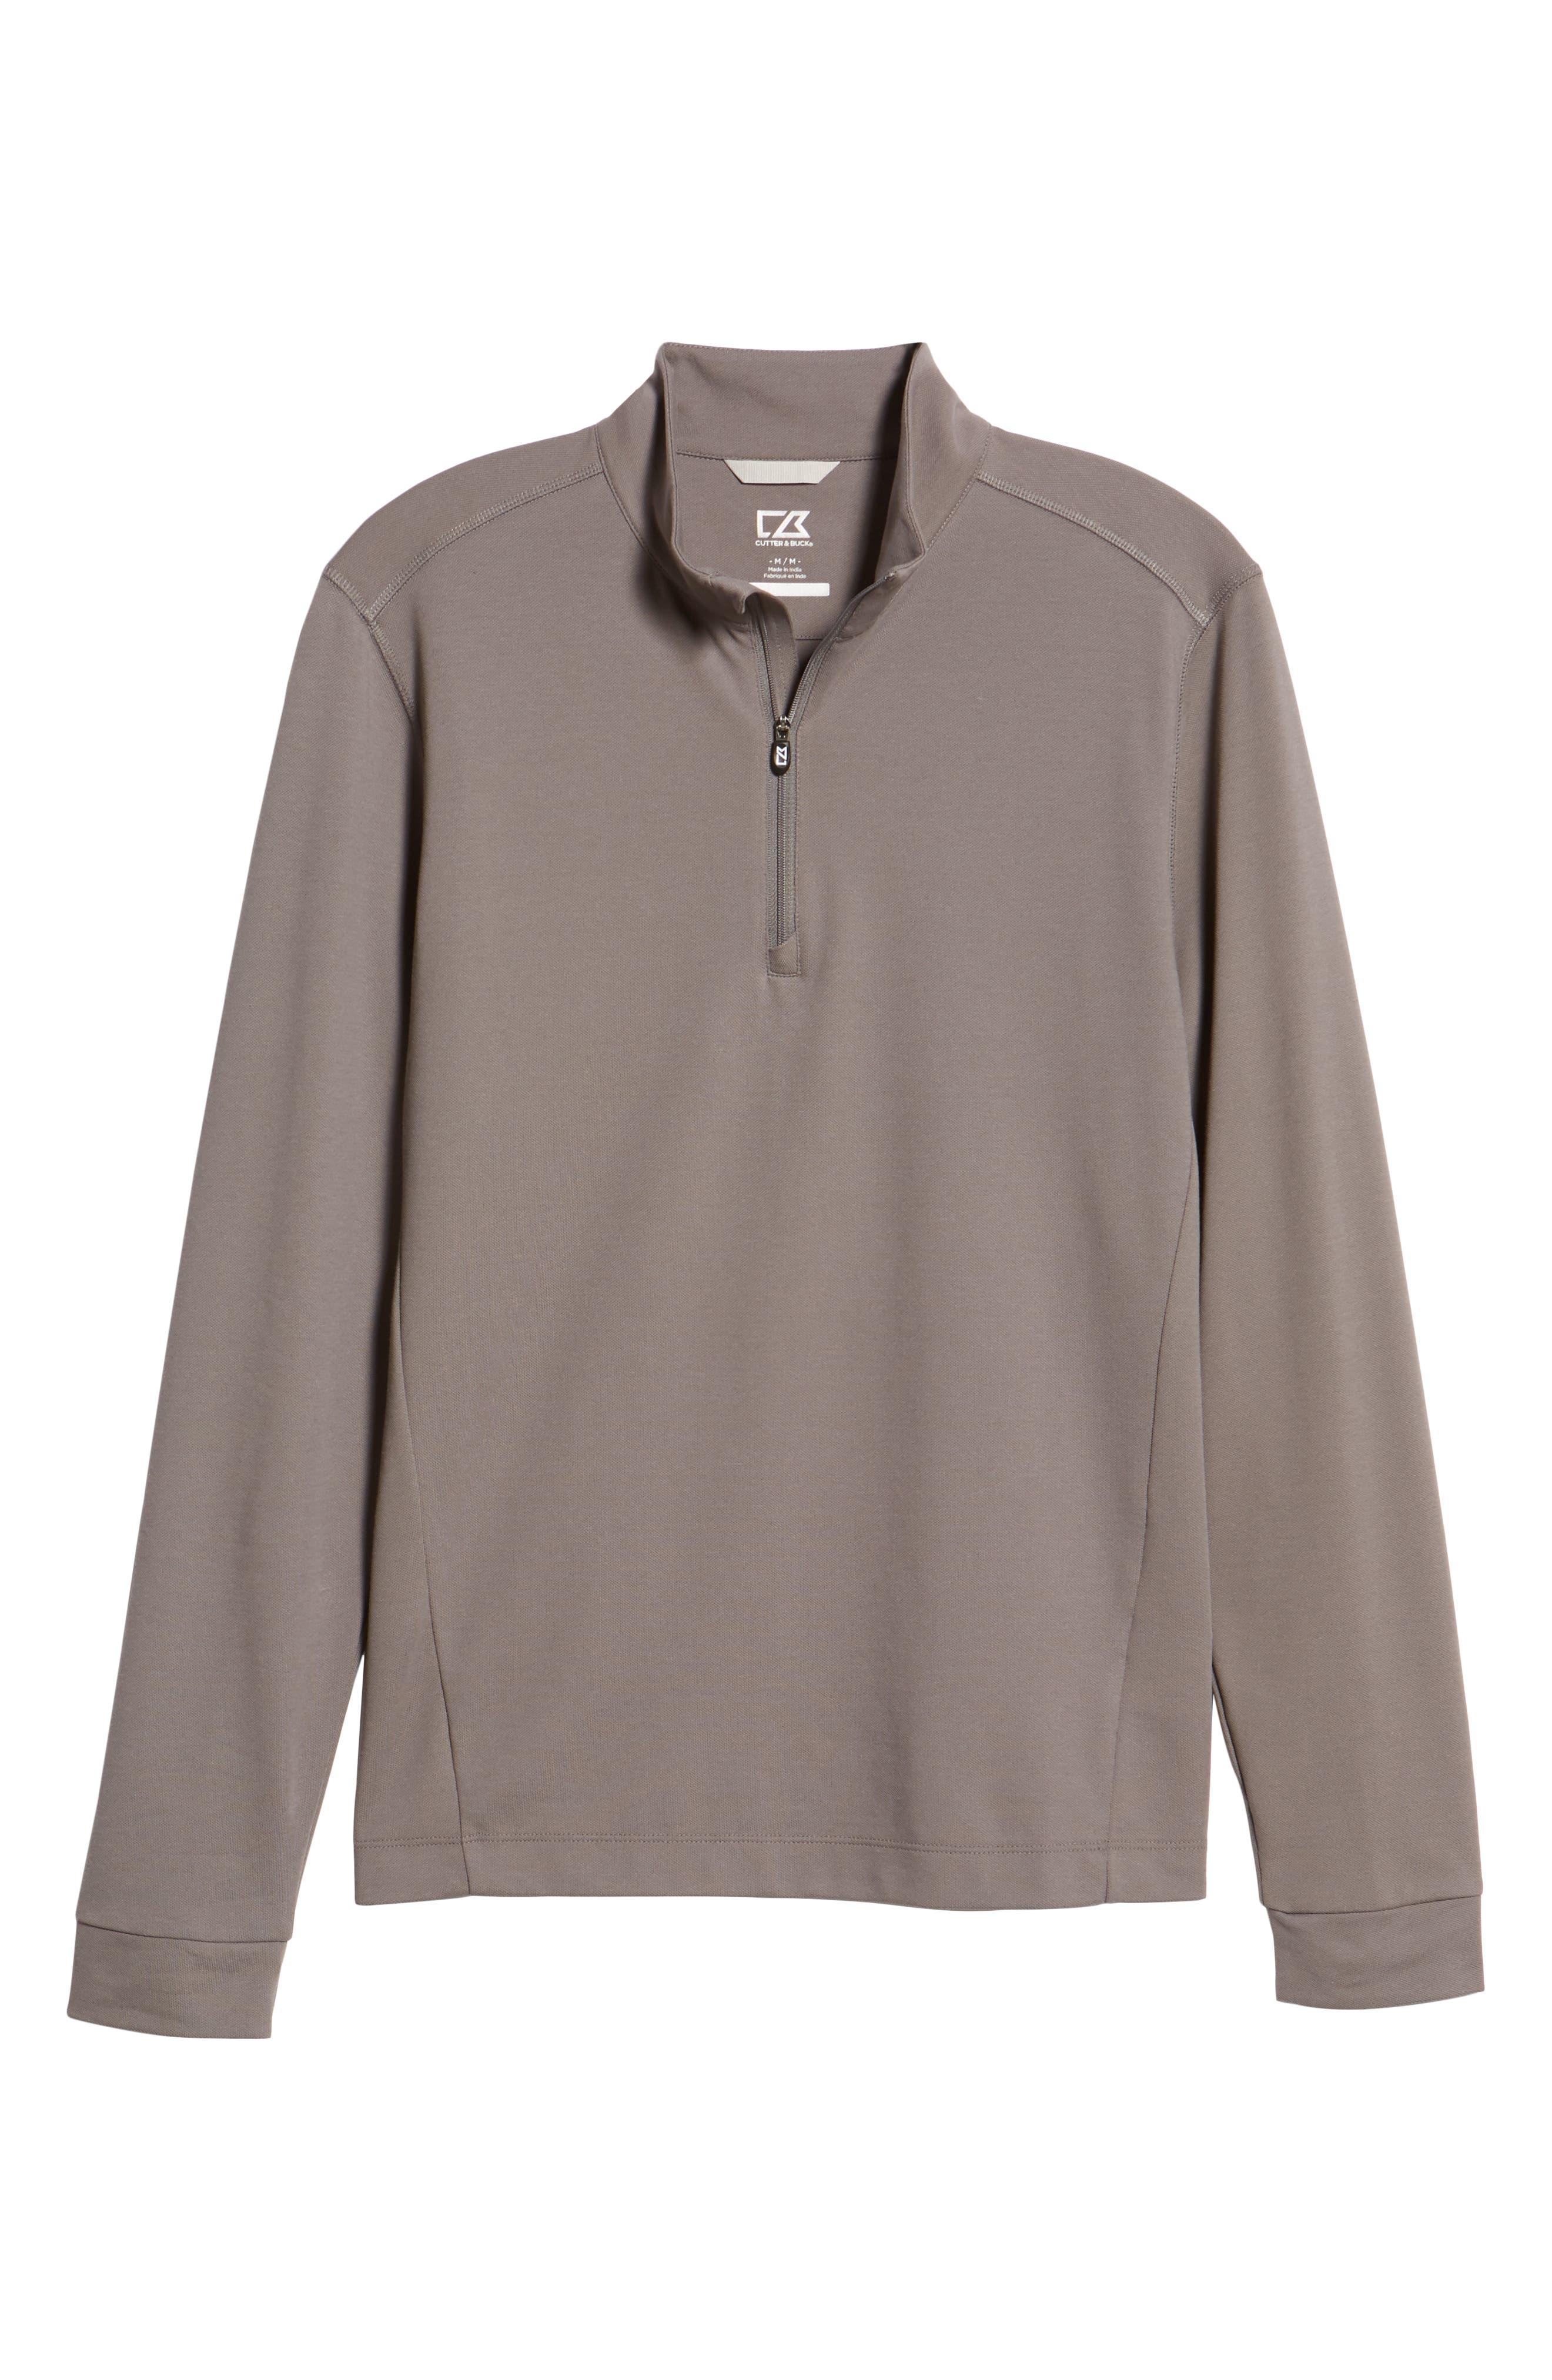 CUTTER & BUCK, Advantage Regular Fit DryTec Mock Neck Pullover, Alternate thumbnail 6, color, ELEMENTAL GREY